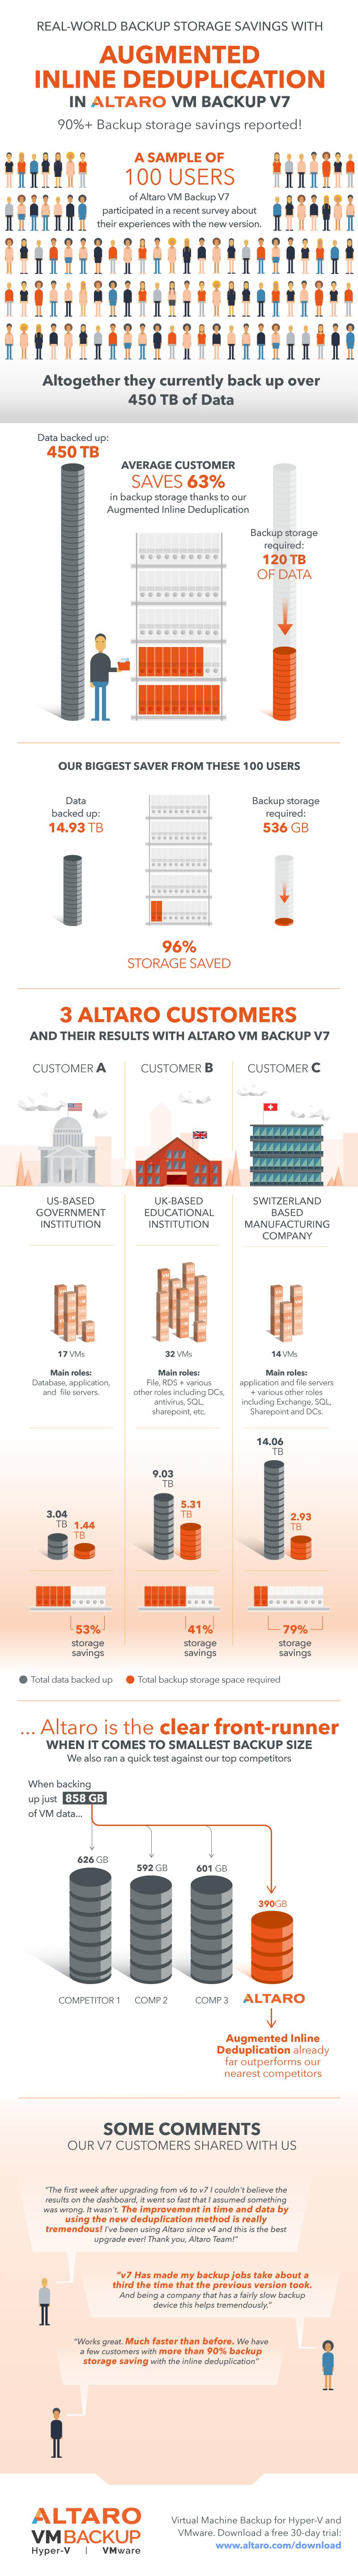 altaro-vm-backup-deduplication-infographic